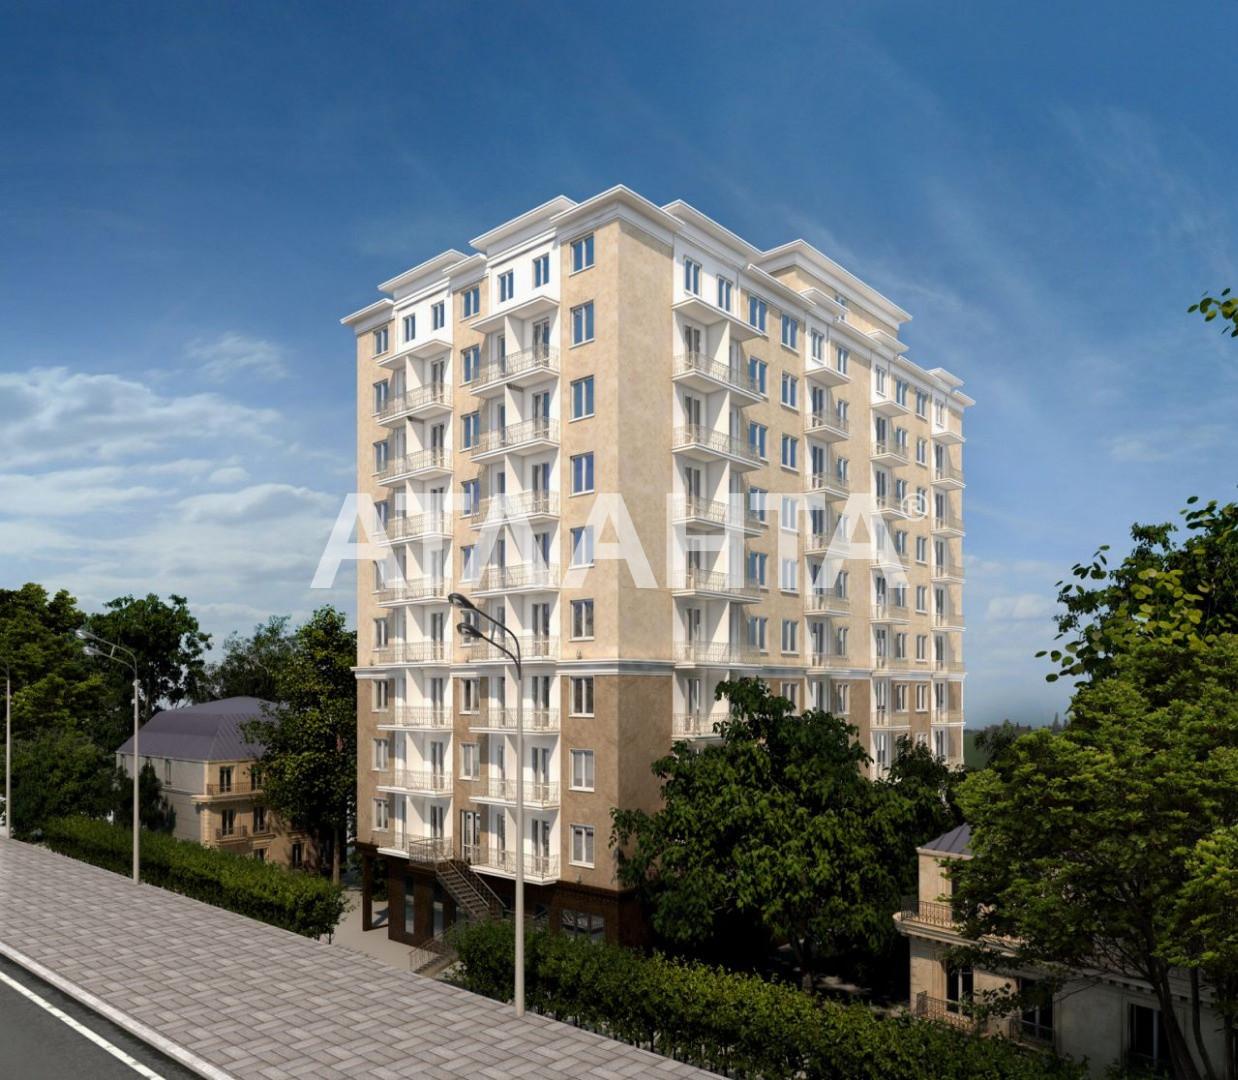 Продается 1-комнатная Квартира на ул. Балковская (Фрунзе) — 22 360 у.е. (фото №2)